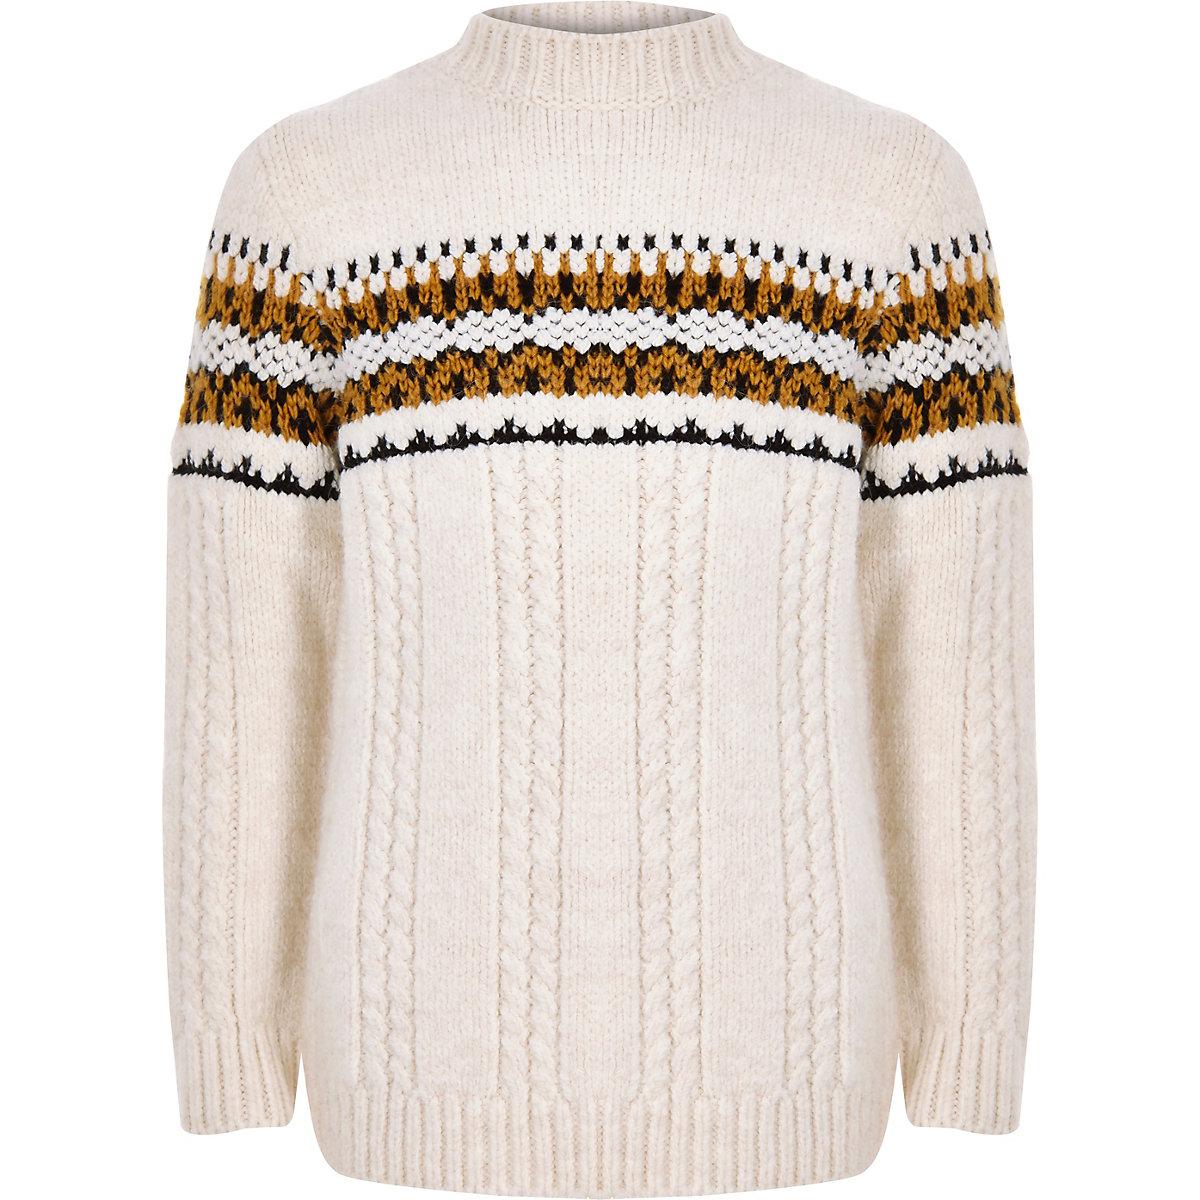 Boys ecru cable knit block high neck jumper